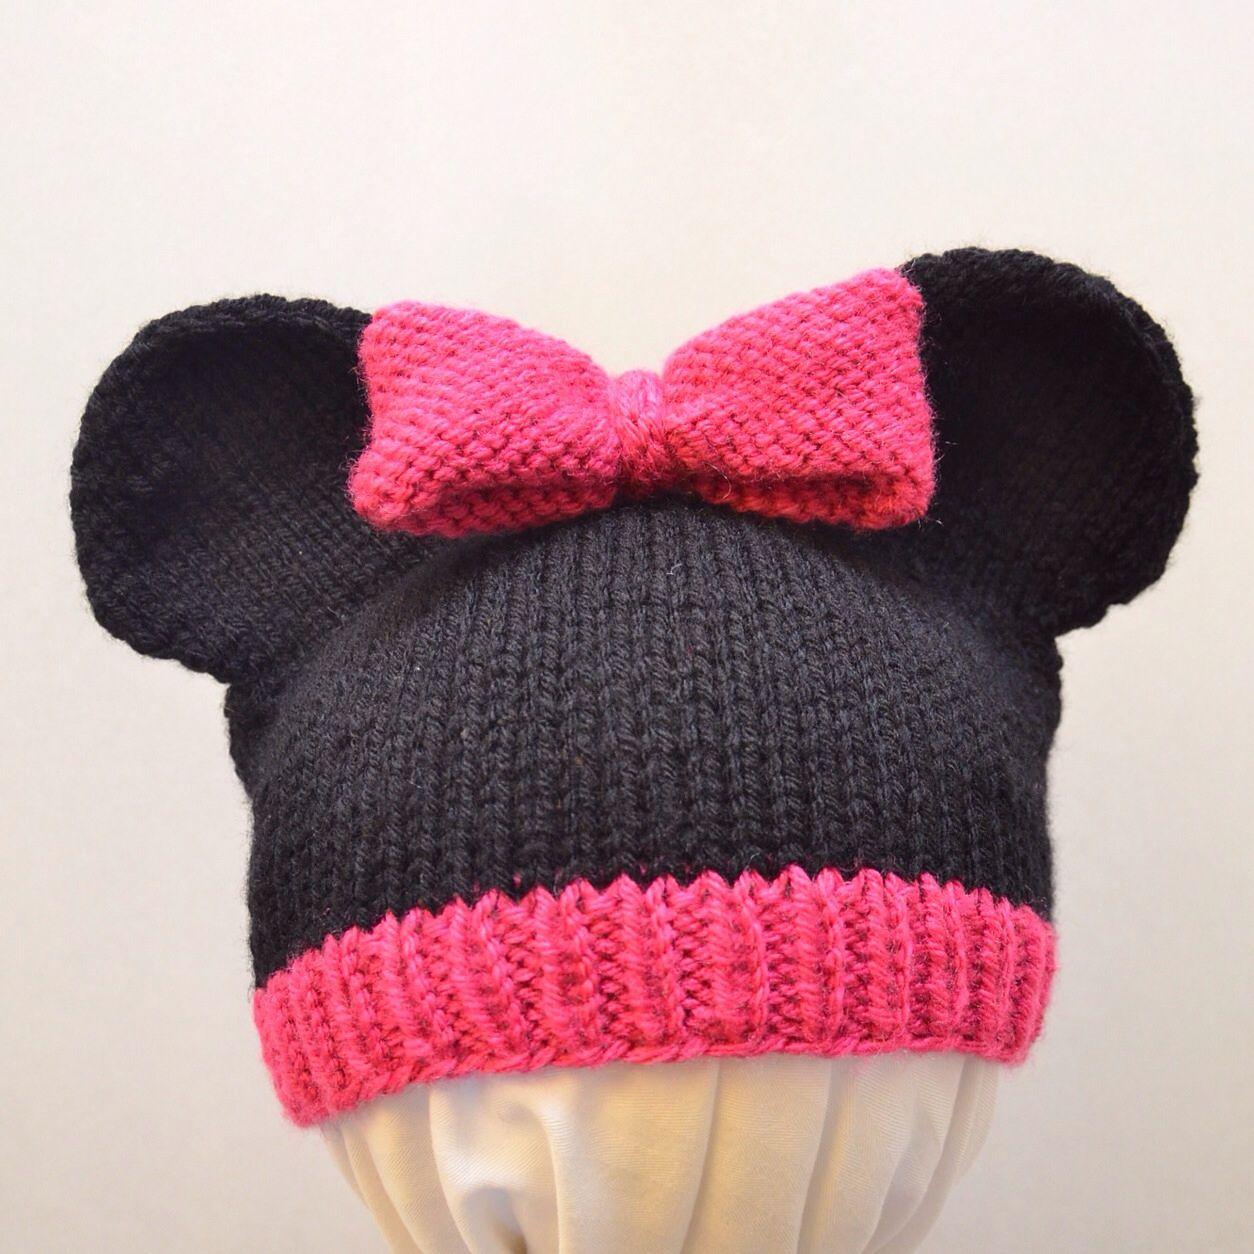 f107632e24b249 Mickey and Minnie Mouse Knit Hat pattern by Cynthia Diosdado   Craft ...